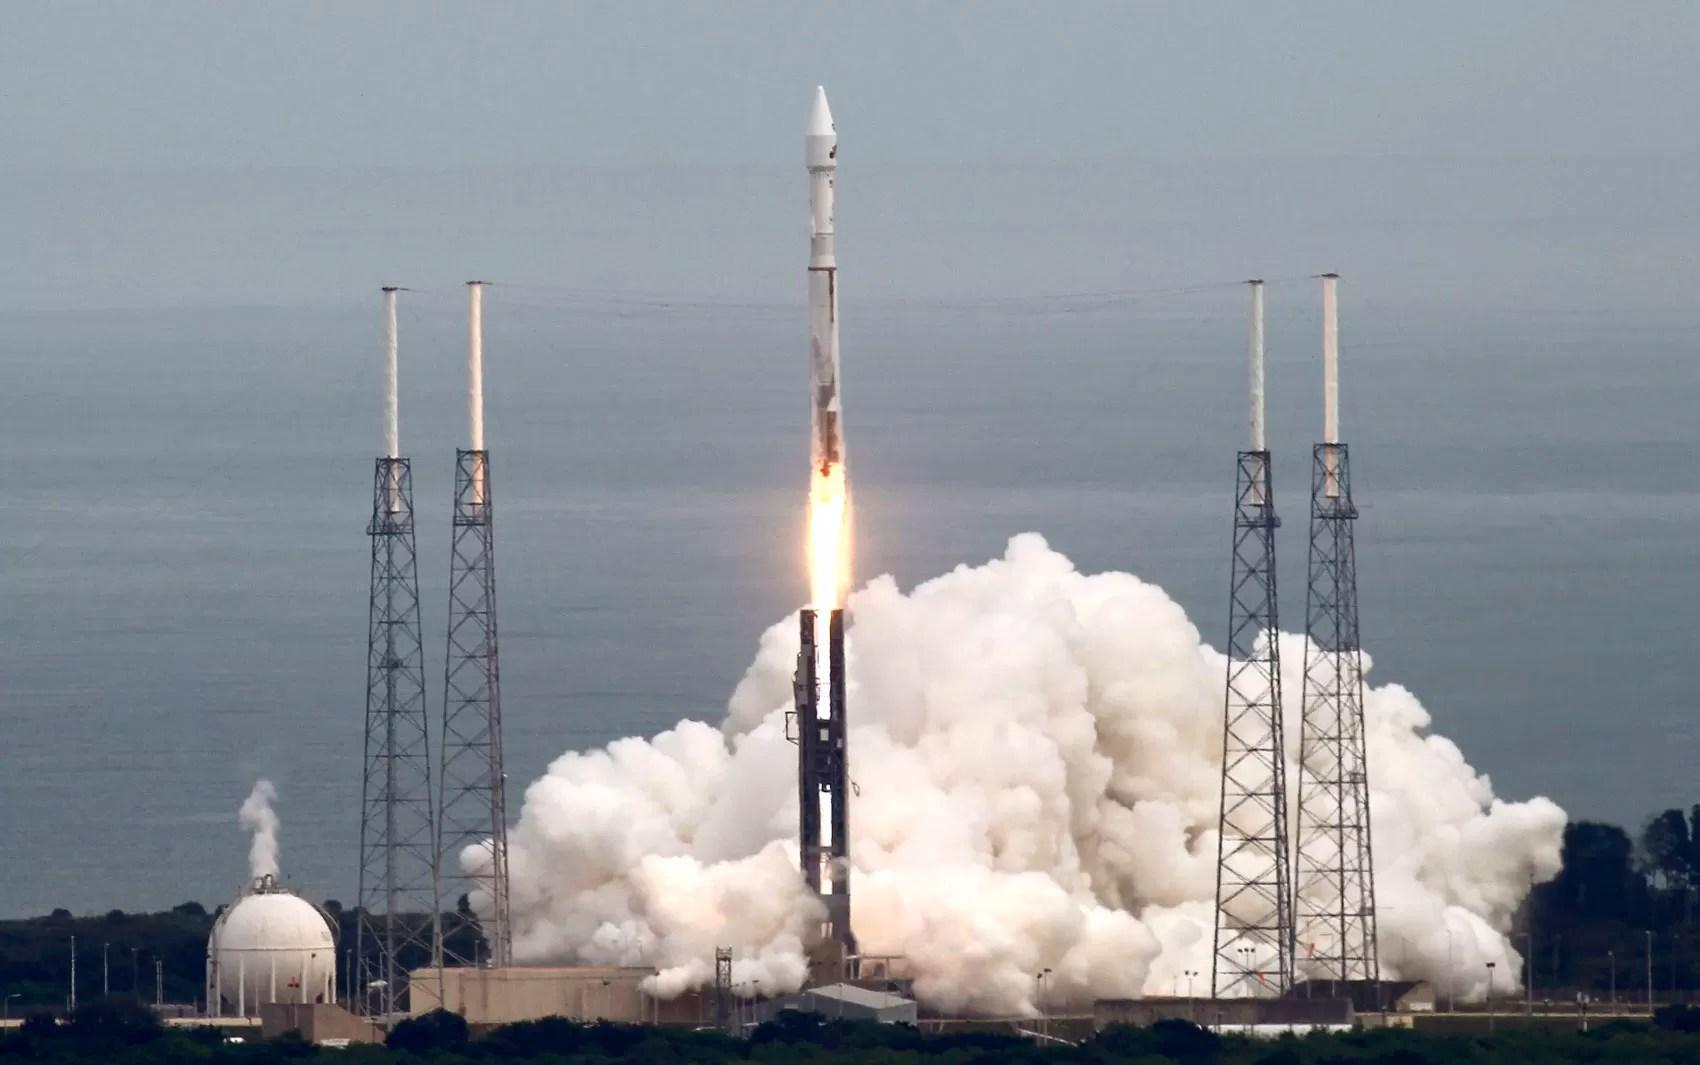 Sonda Maven, que fará missão em Marte, é lançada de Cabo Canaveral, na Flórida (Foto: Michael Berrigan/Reuters)